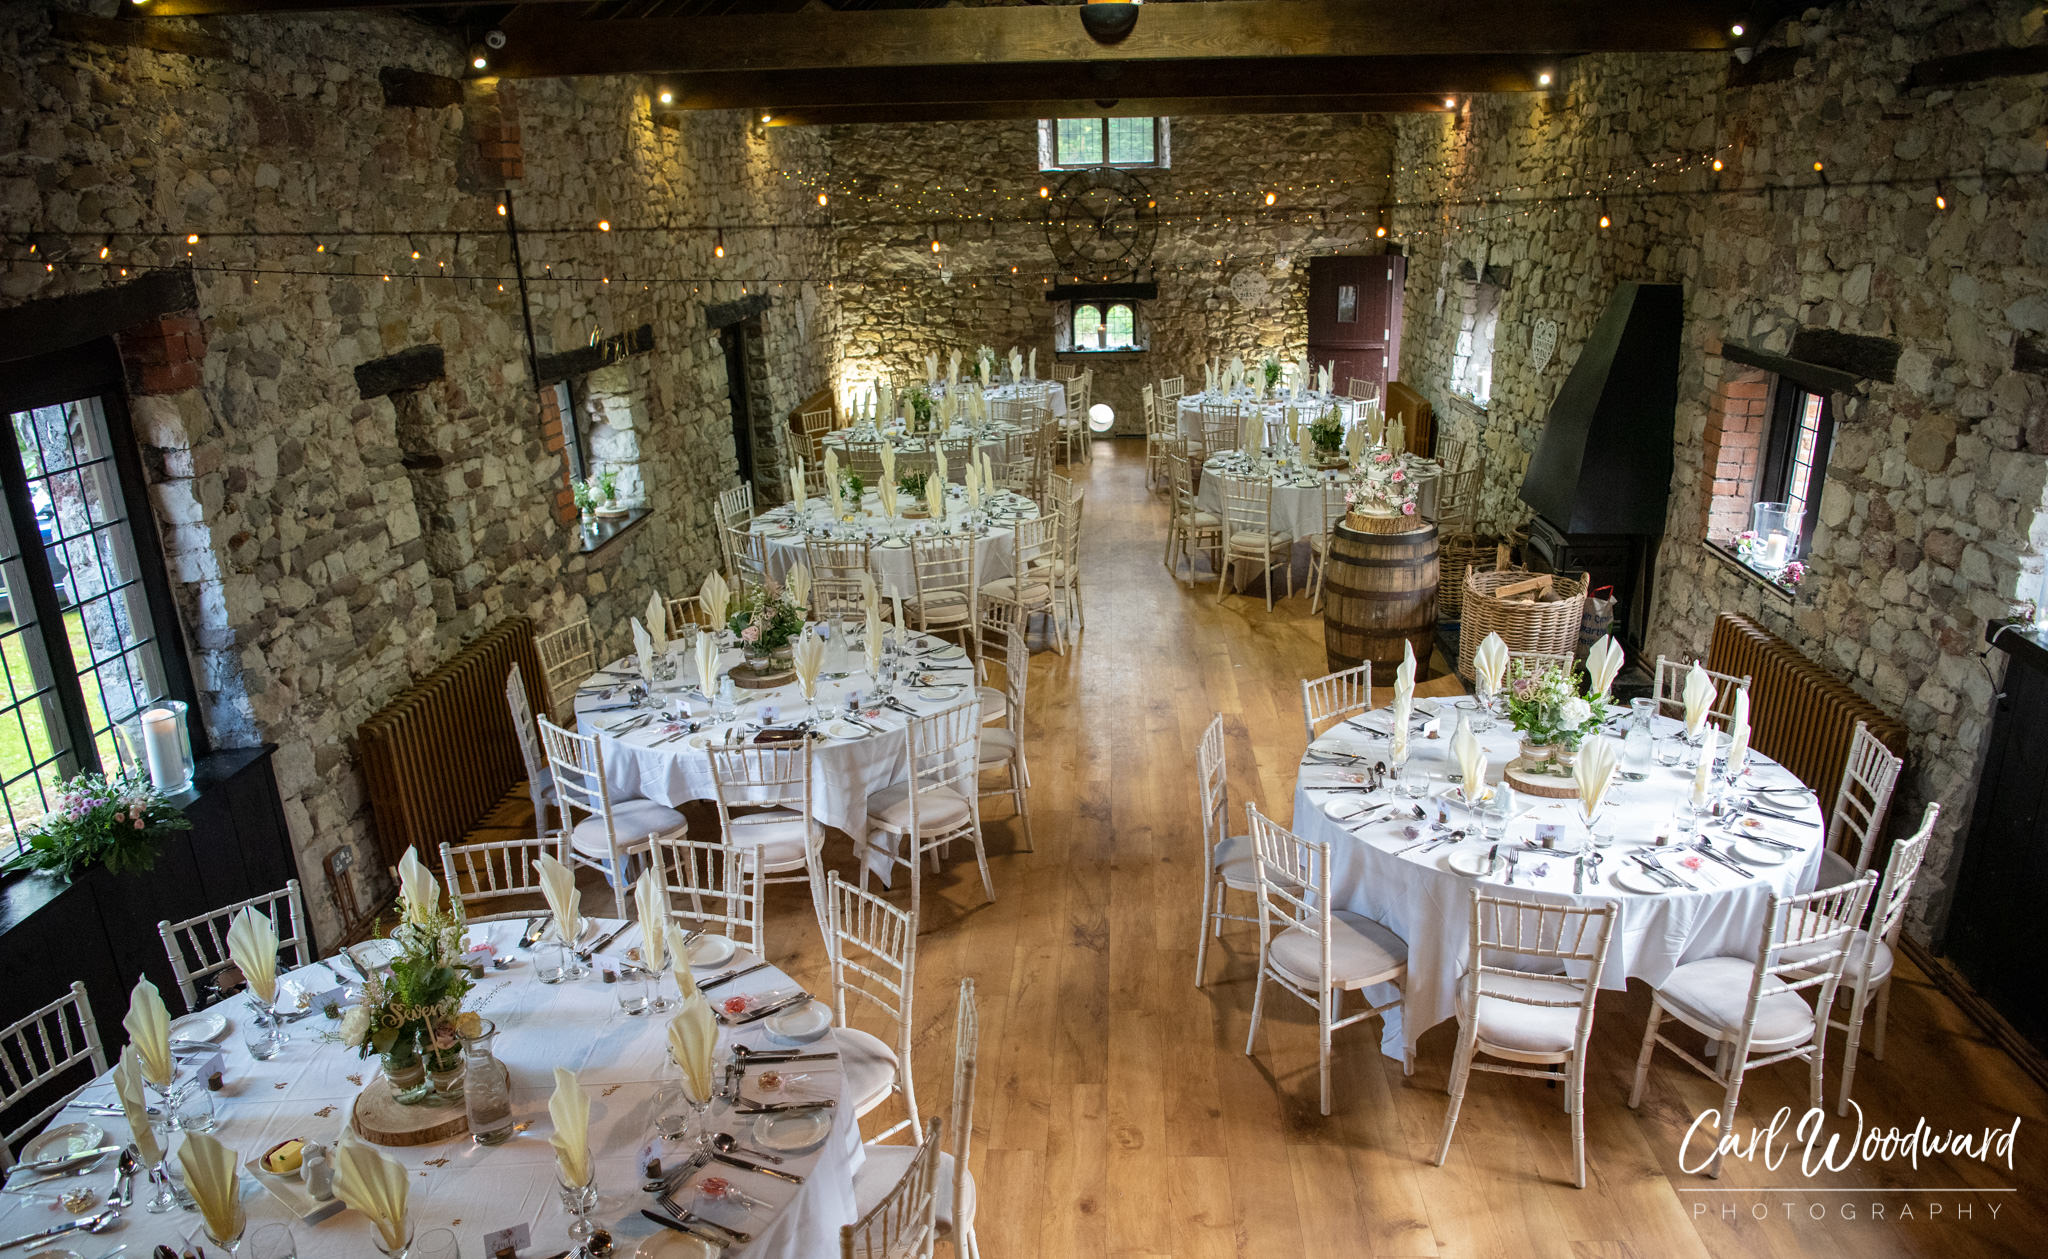 009-pencoed-house-estate-wedding-wedding-photography-cardiff-wedding-photographer.jpg